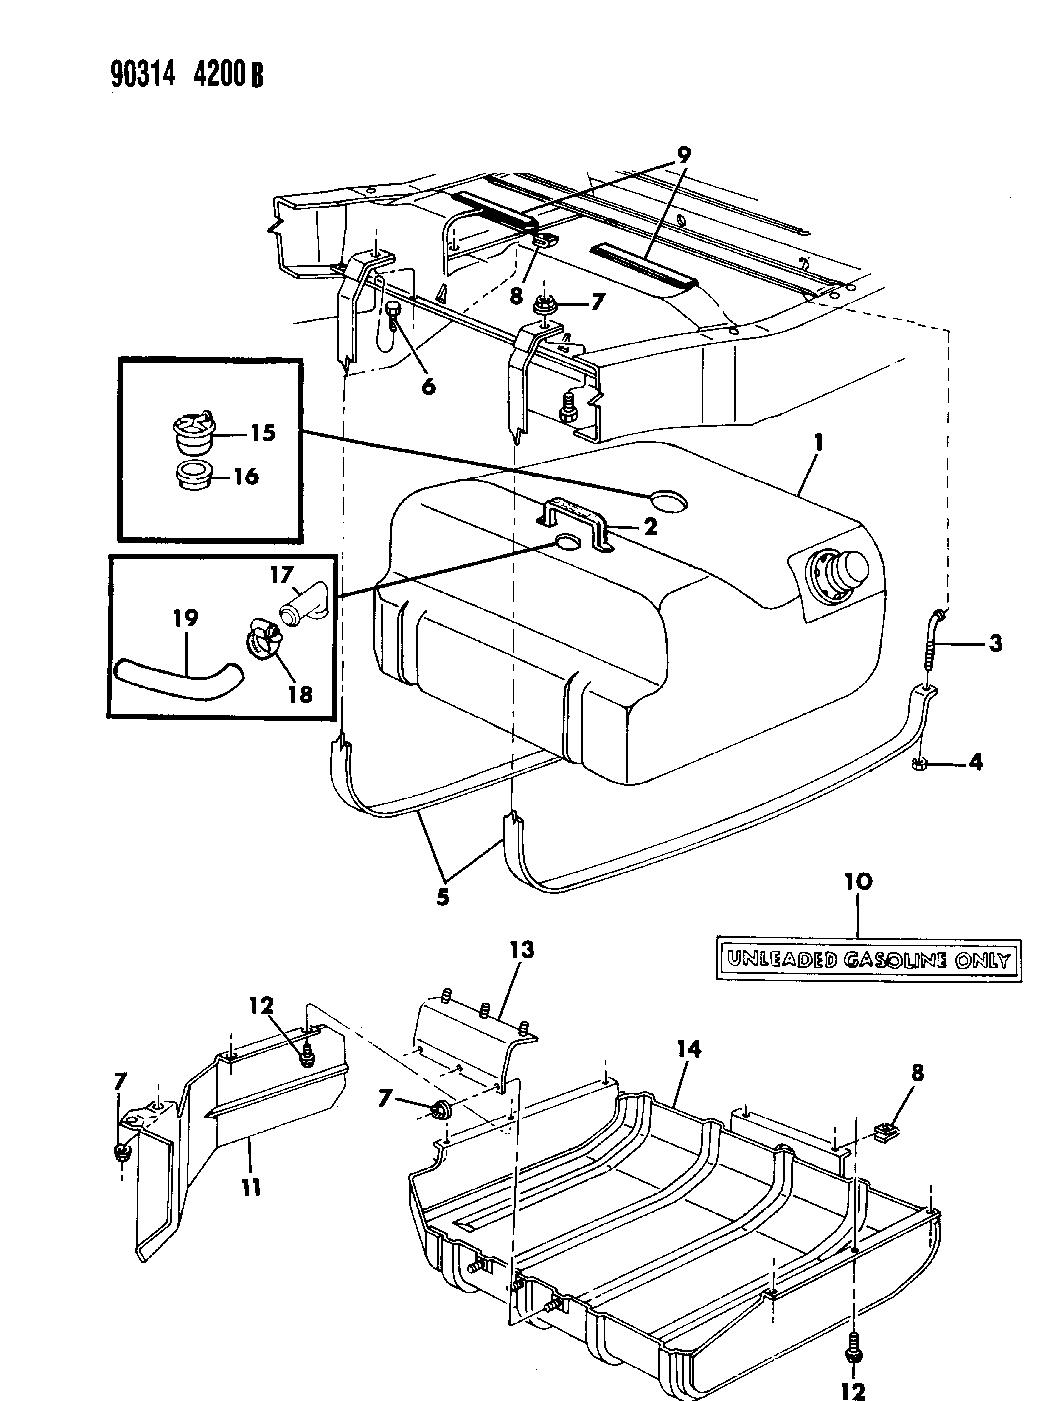 1993 Dodge Ramcharger Fuel Tank - Thumbnail 2